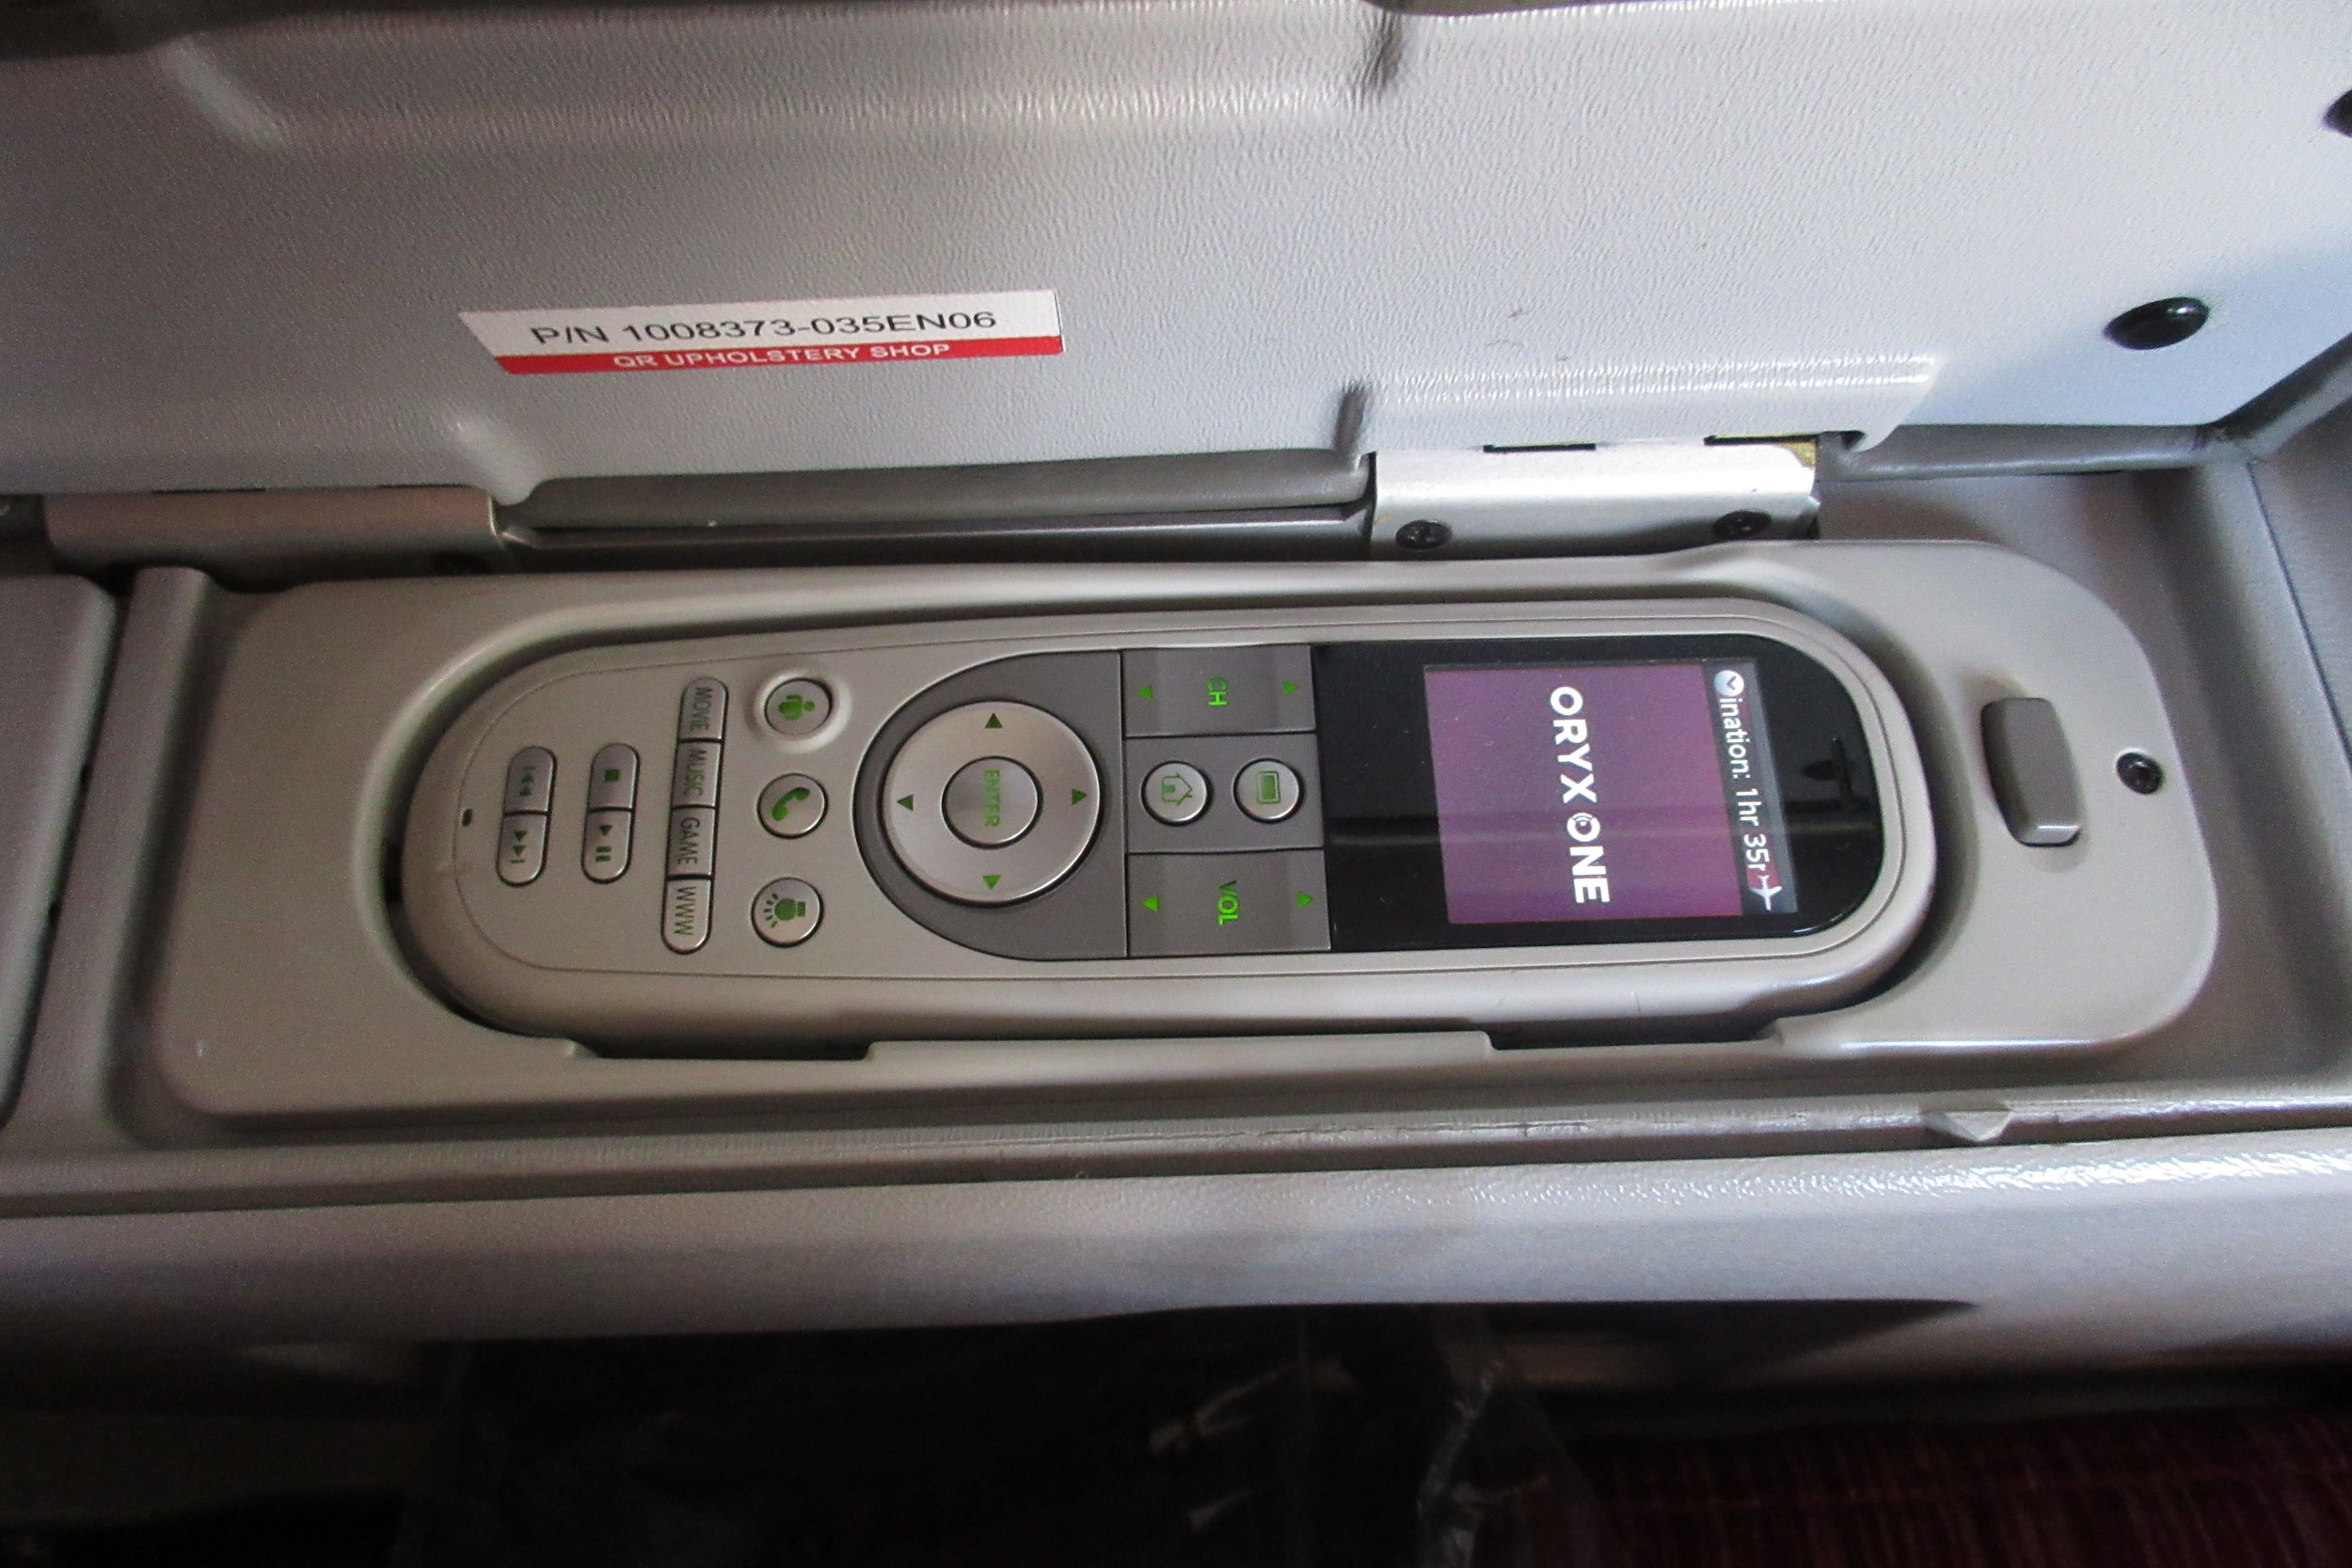 Qatar Airways 777 business class – Entertainment controls